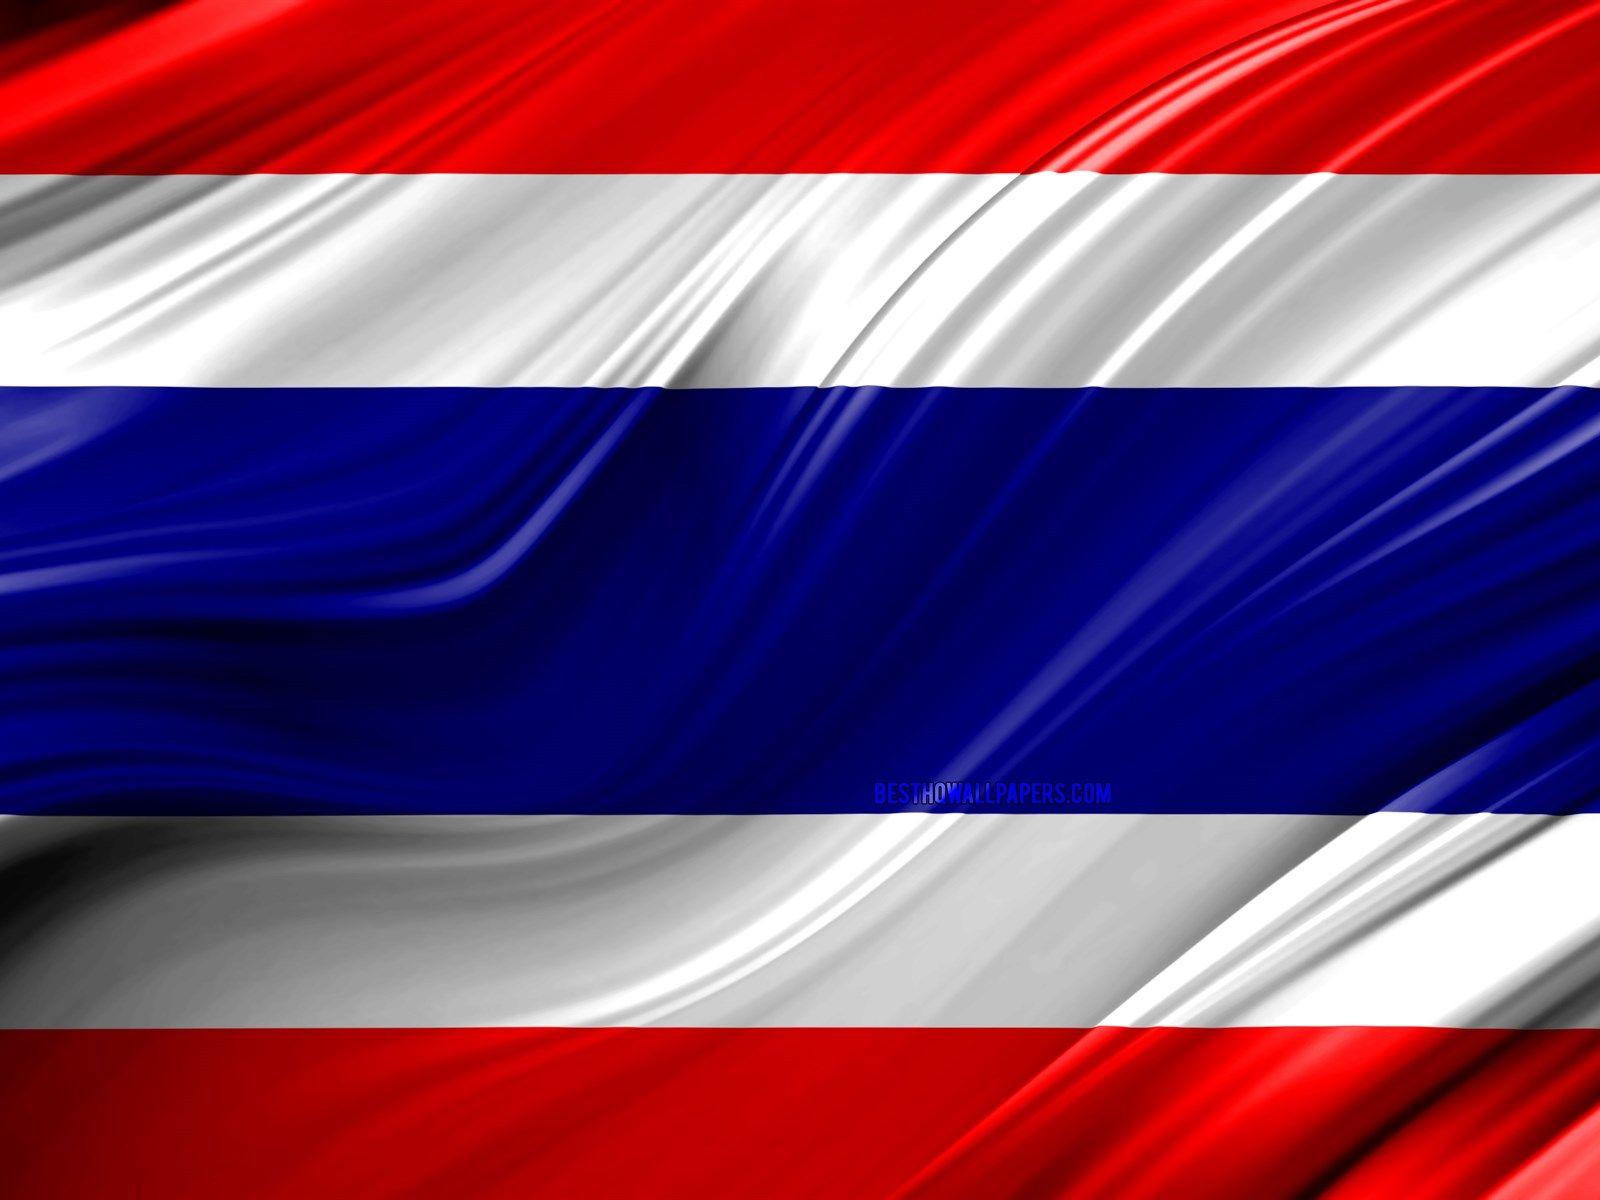 4k Thai Flag Asian Countries 3d Waves Flag Of Thailand National Symbols Thailand 3d Flag Art Asia Thai Thai Flag Motorcycles Logo Design Thailand Flag